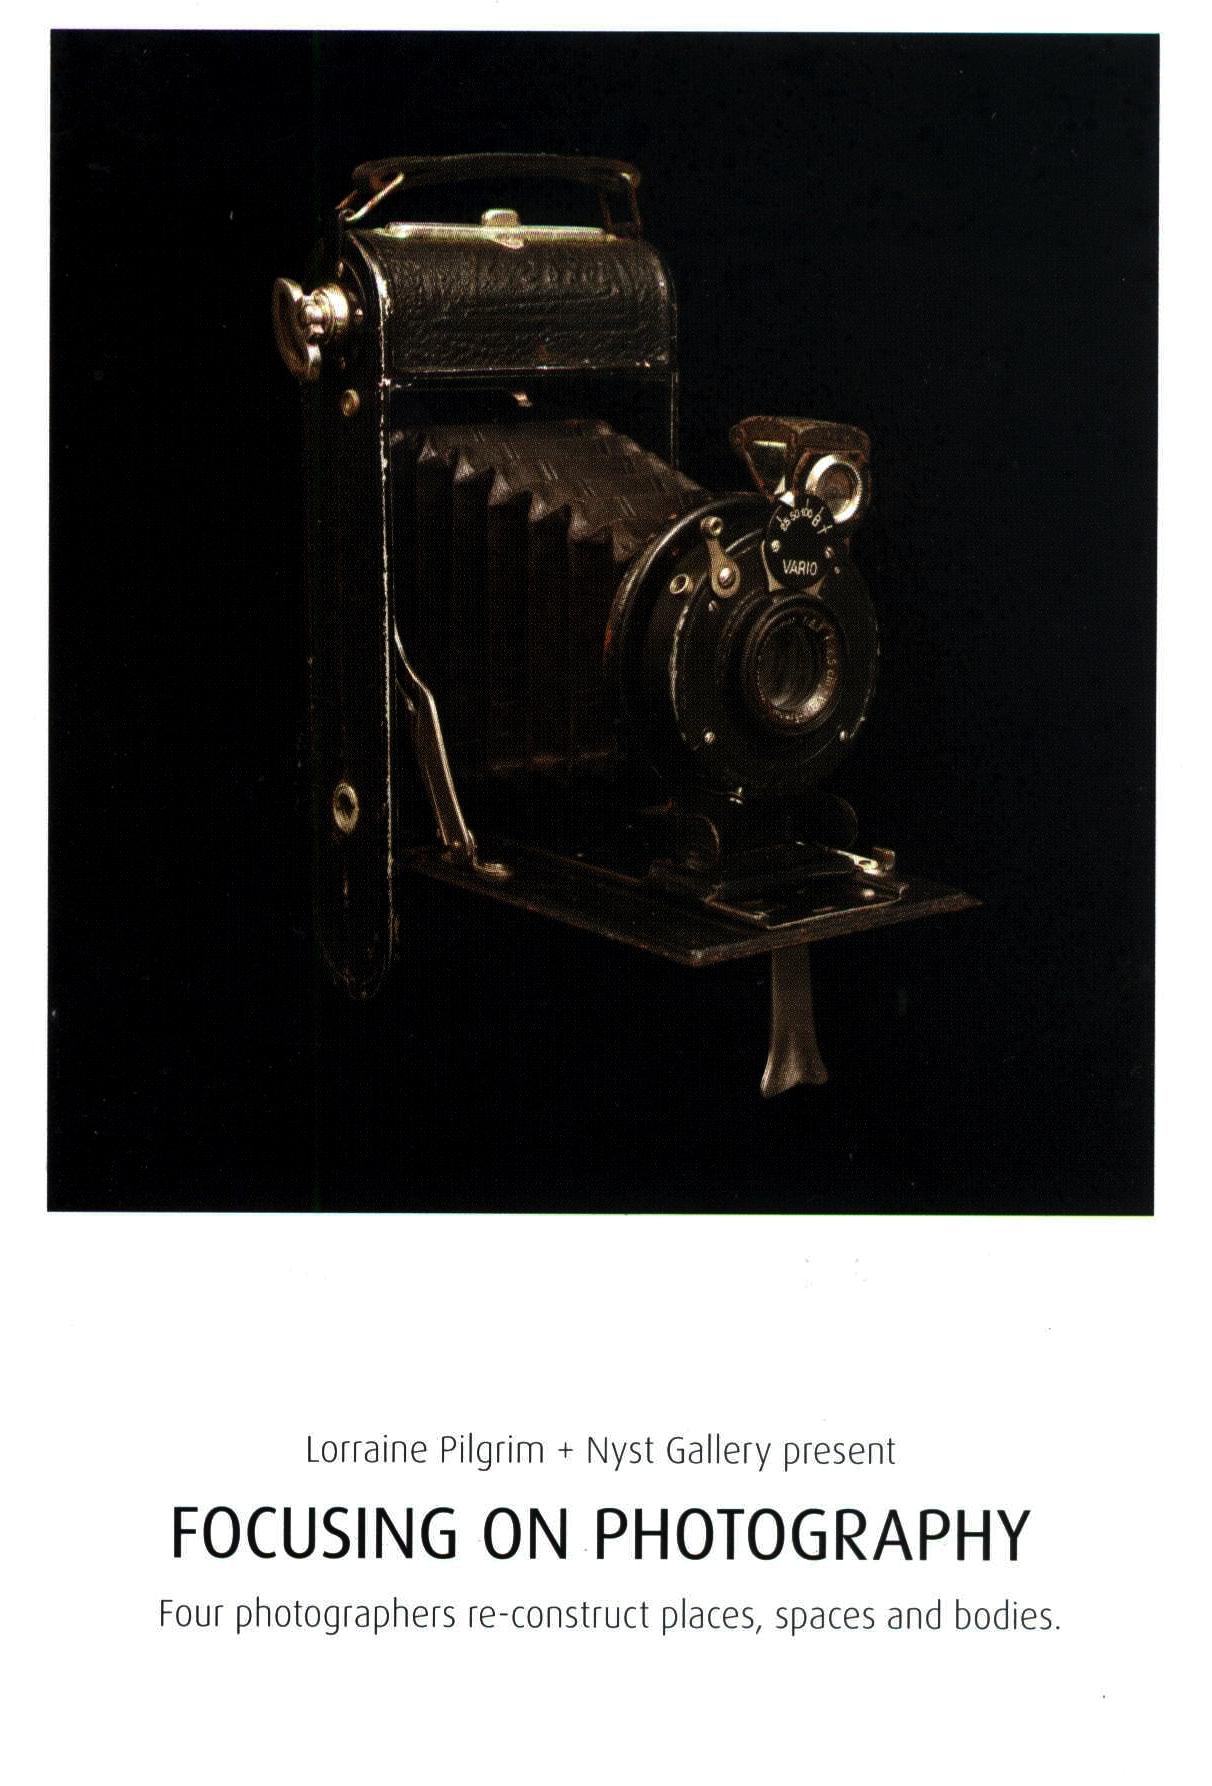 Focusing on Photography exhibition at Lorraine Pilgrim Gallery